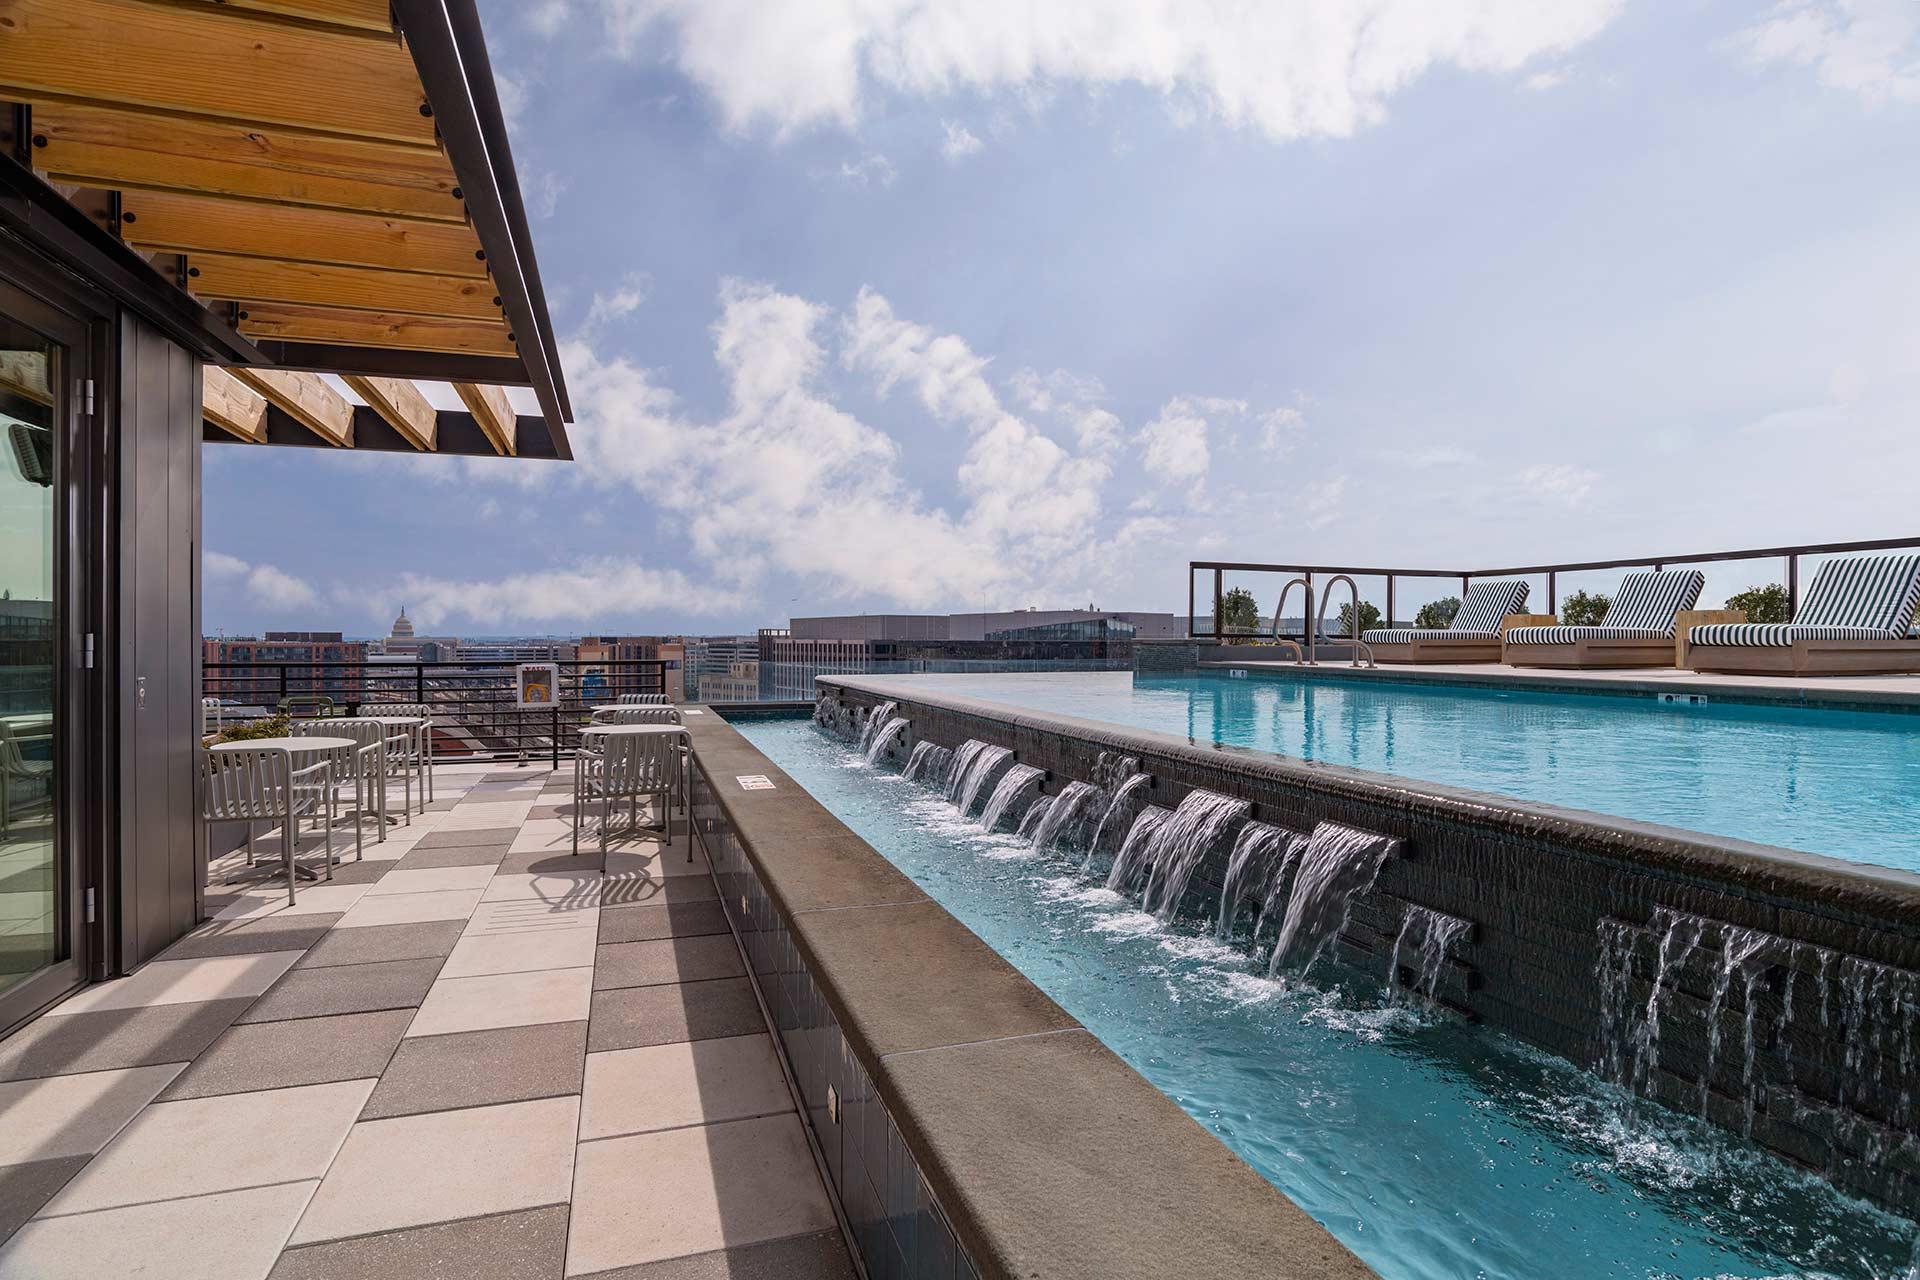 infinity pool with waterfall overlooking city